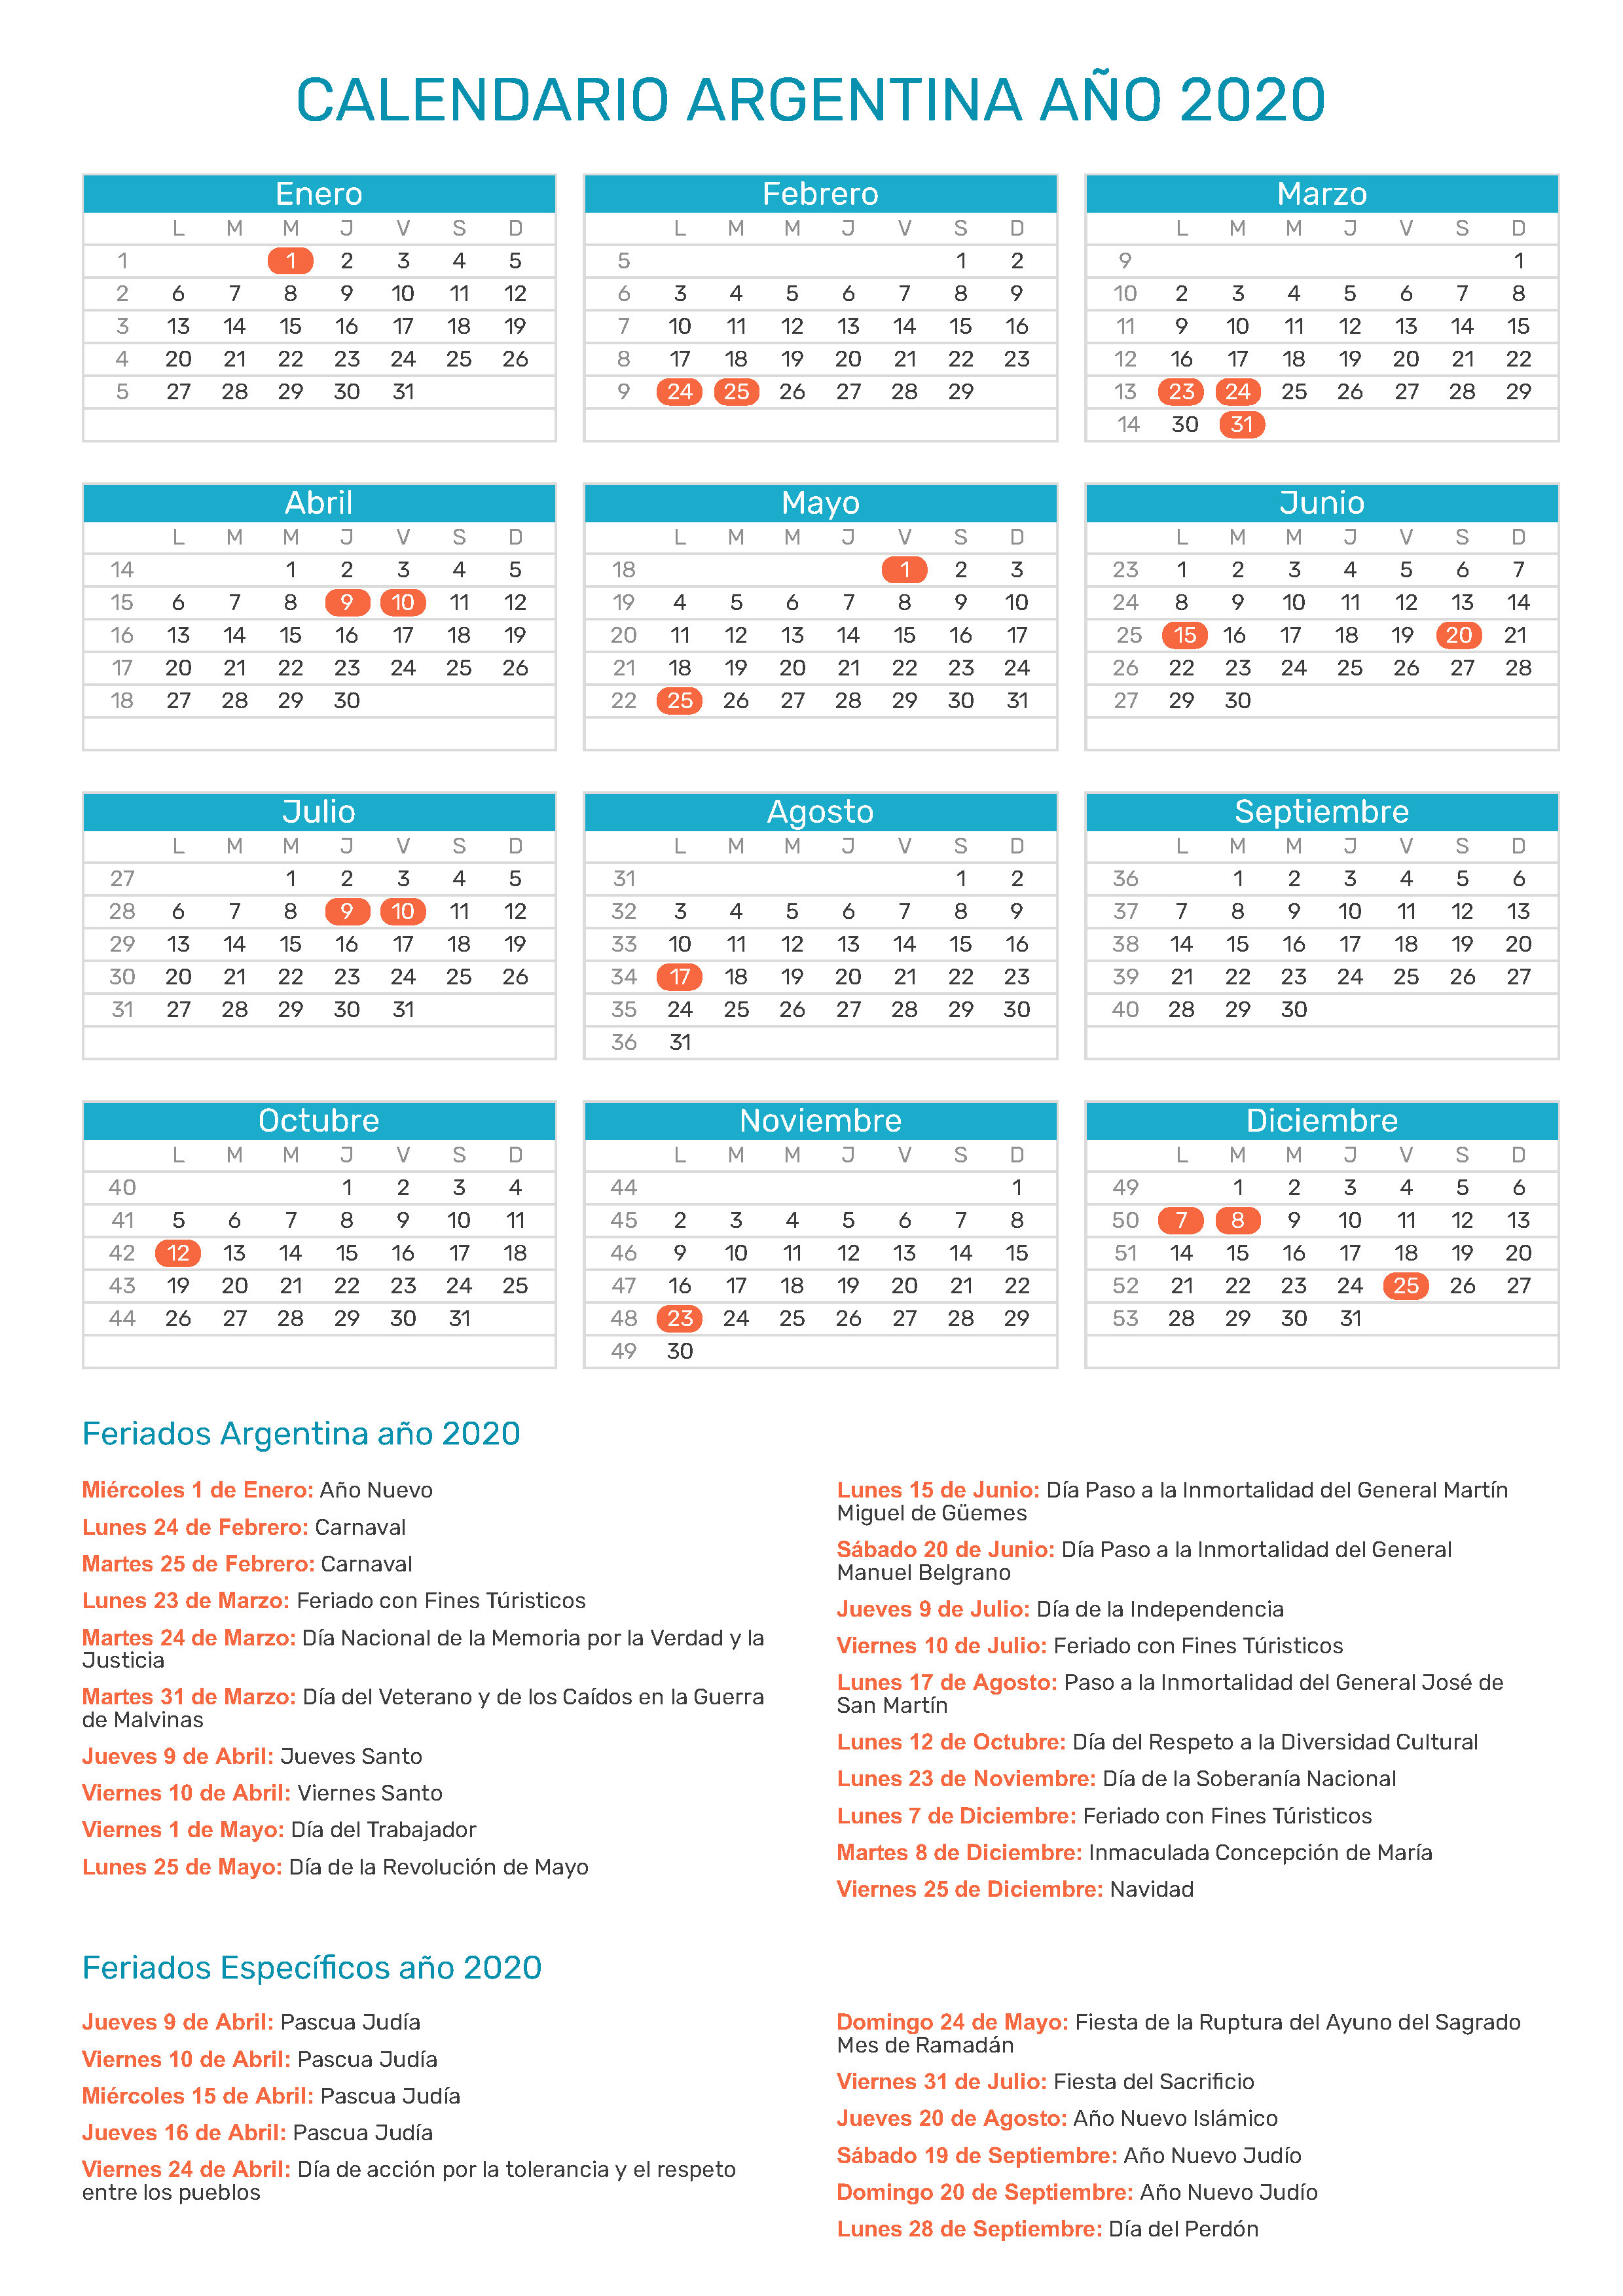 Calendario 2020trackidsp 006.Calendario De Argentina Ano 2020 Feriados